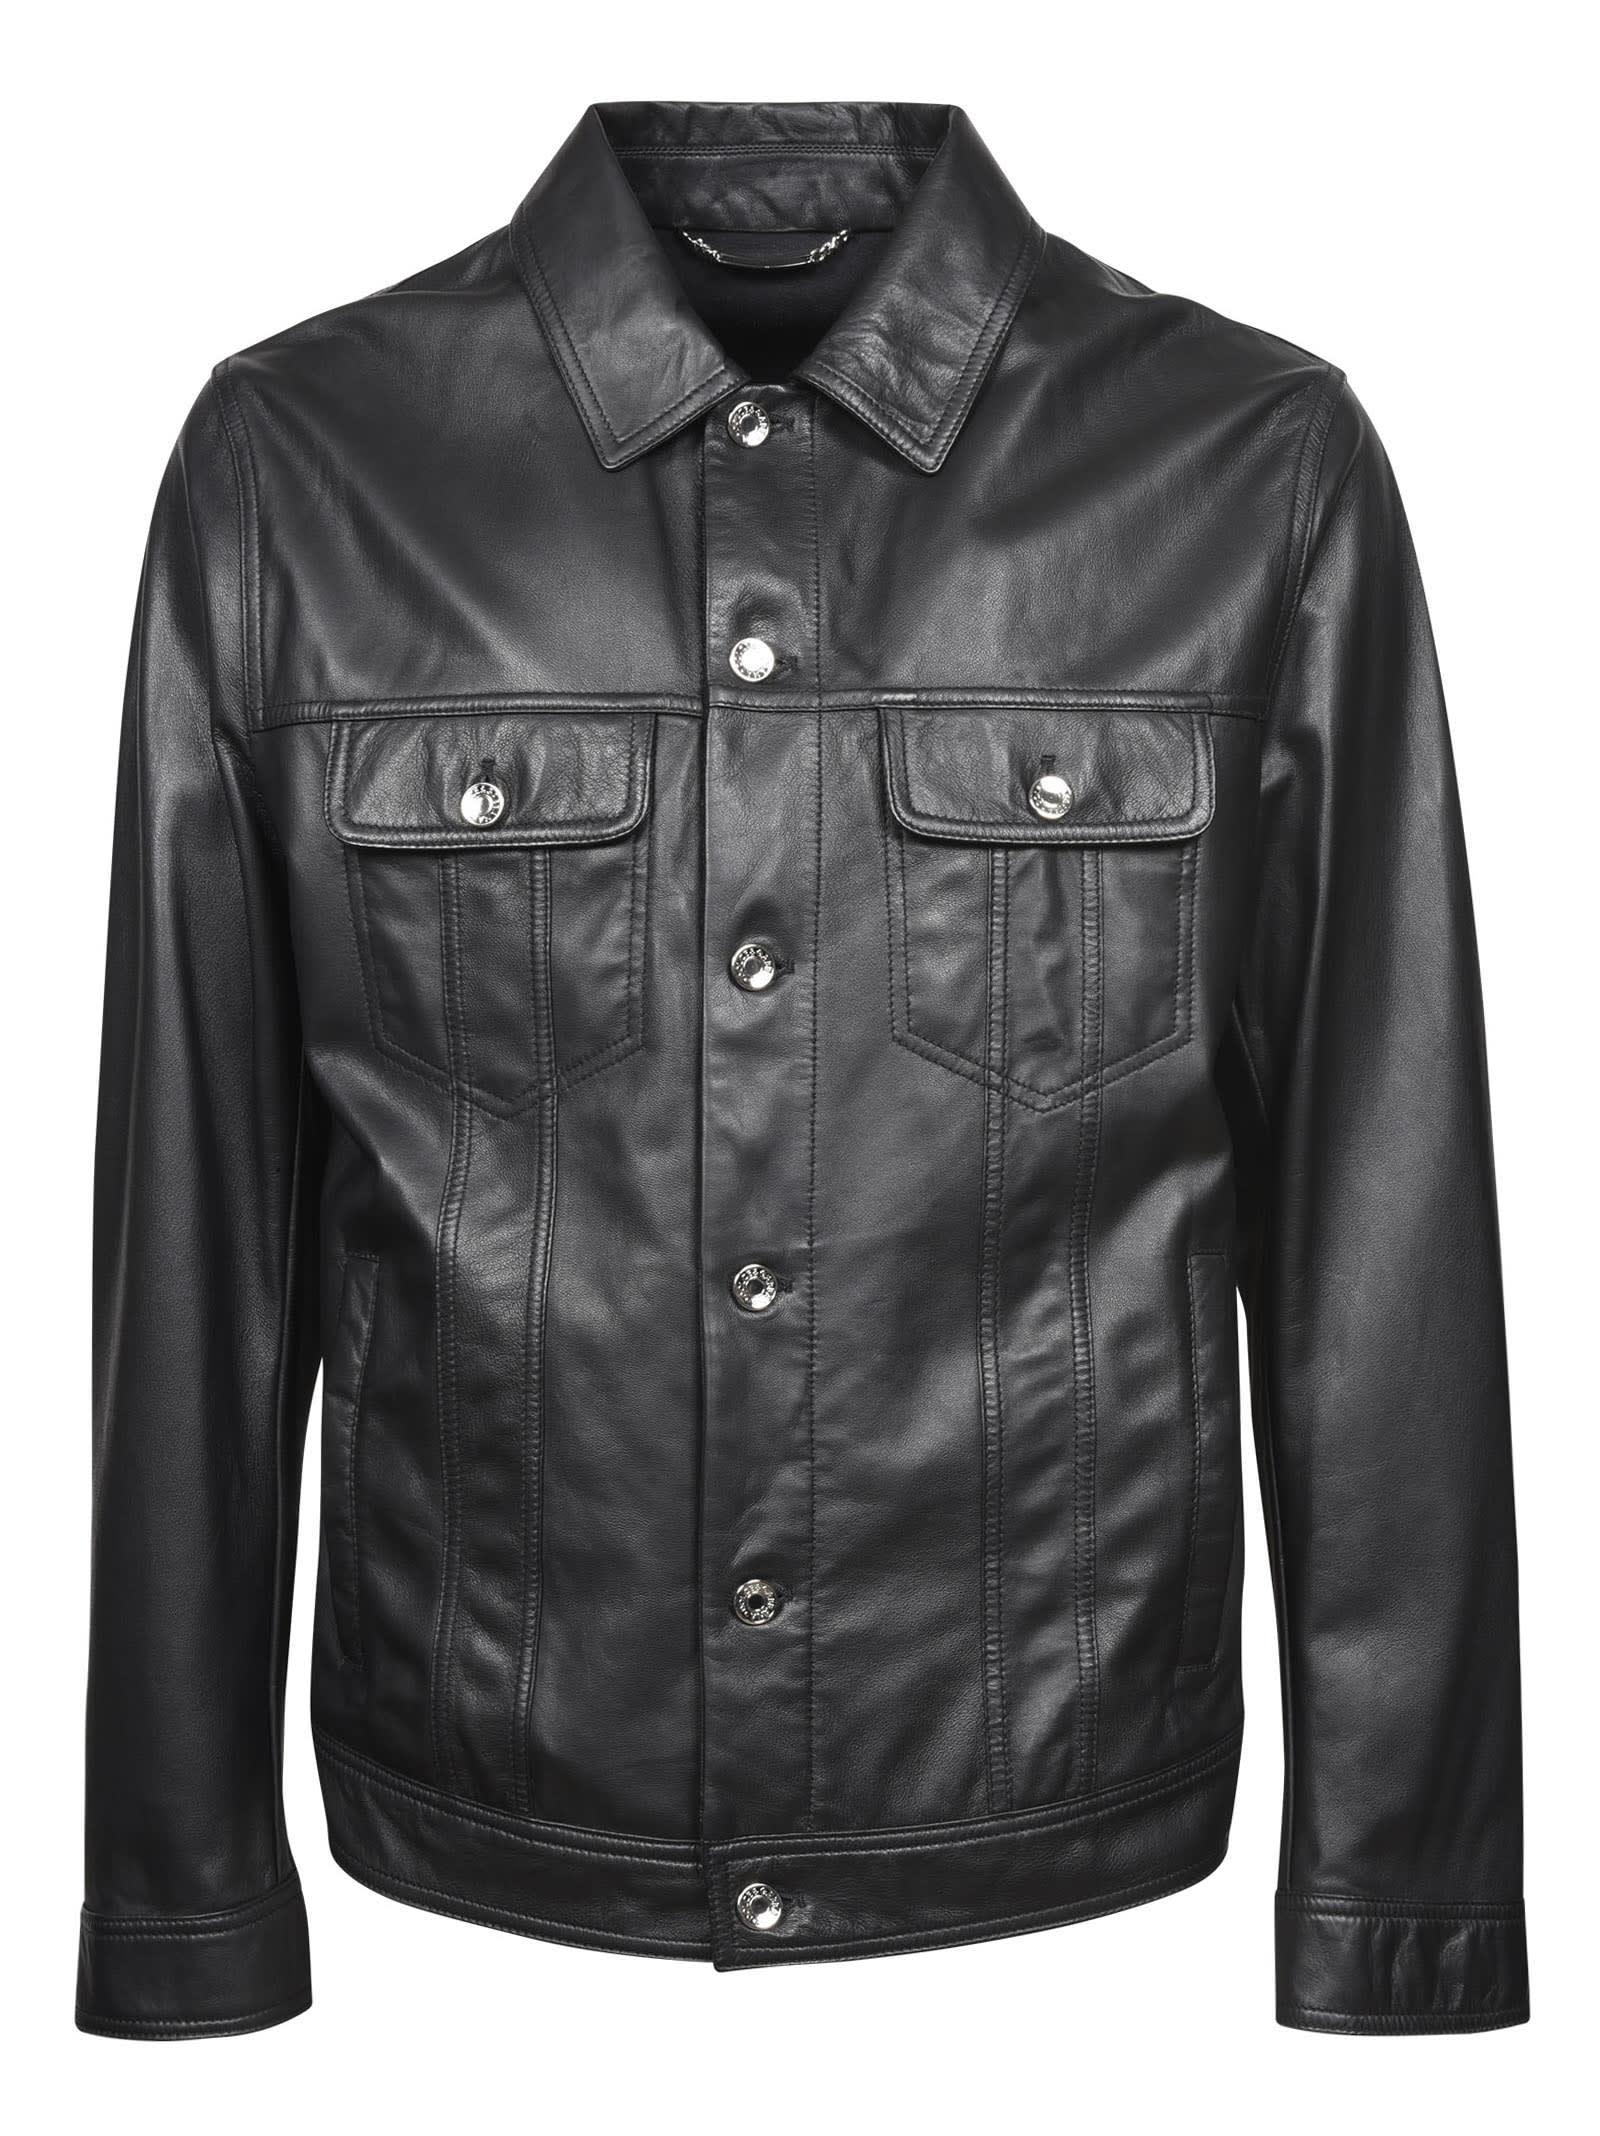 Dolce & Gabbana Leathers CLASSIC LEATHER JACKET